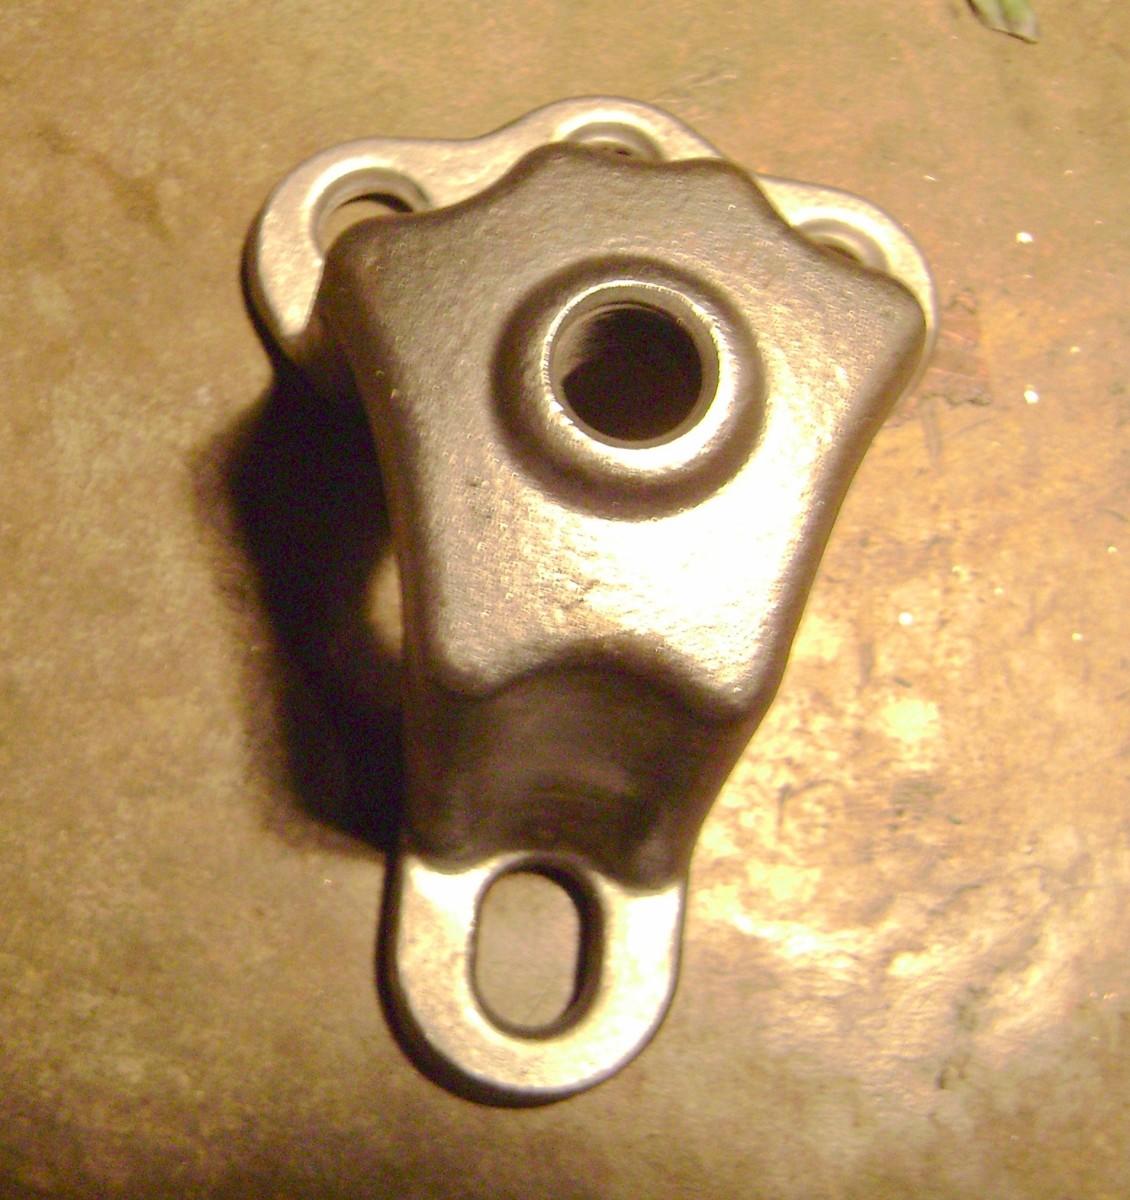 H.  Hub puller tool